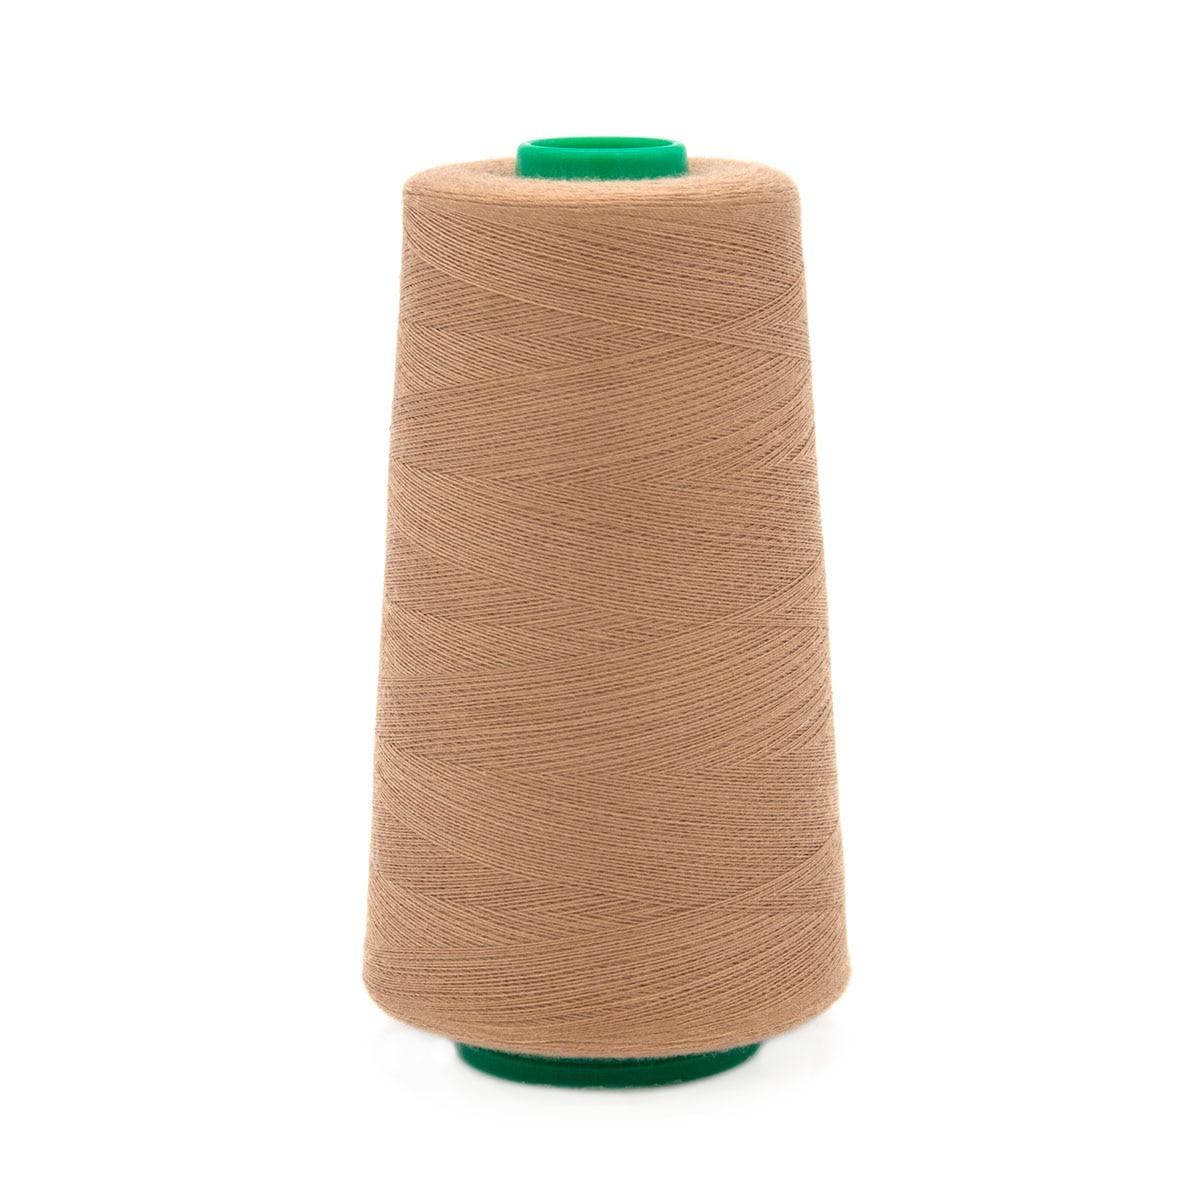 Linha de costura universal, 50/2, 5000 jarda, 100% pe, bestex * venda * (259 st. nut)